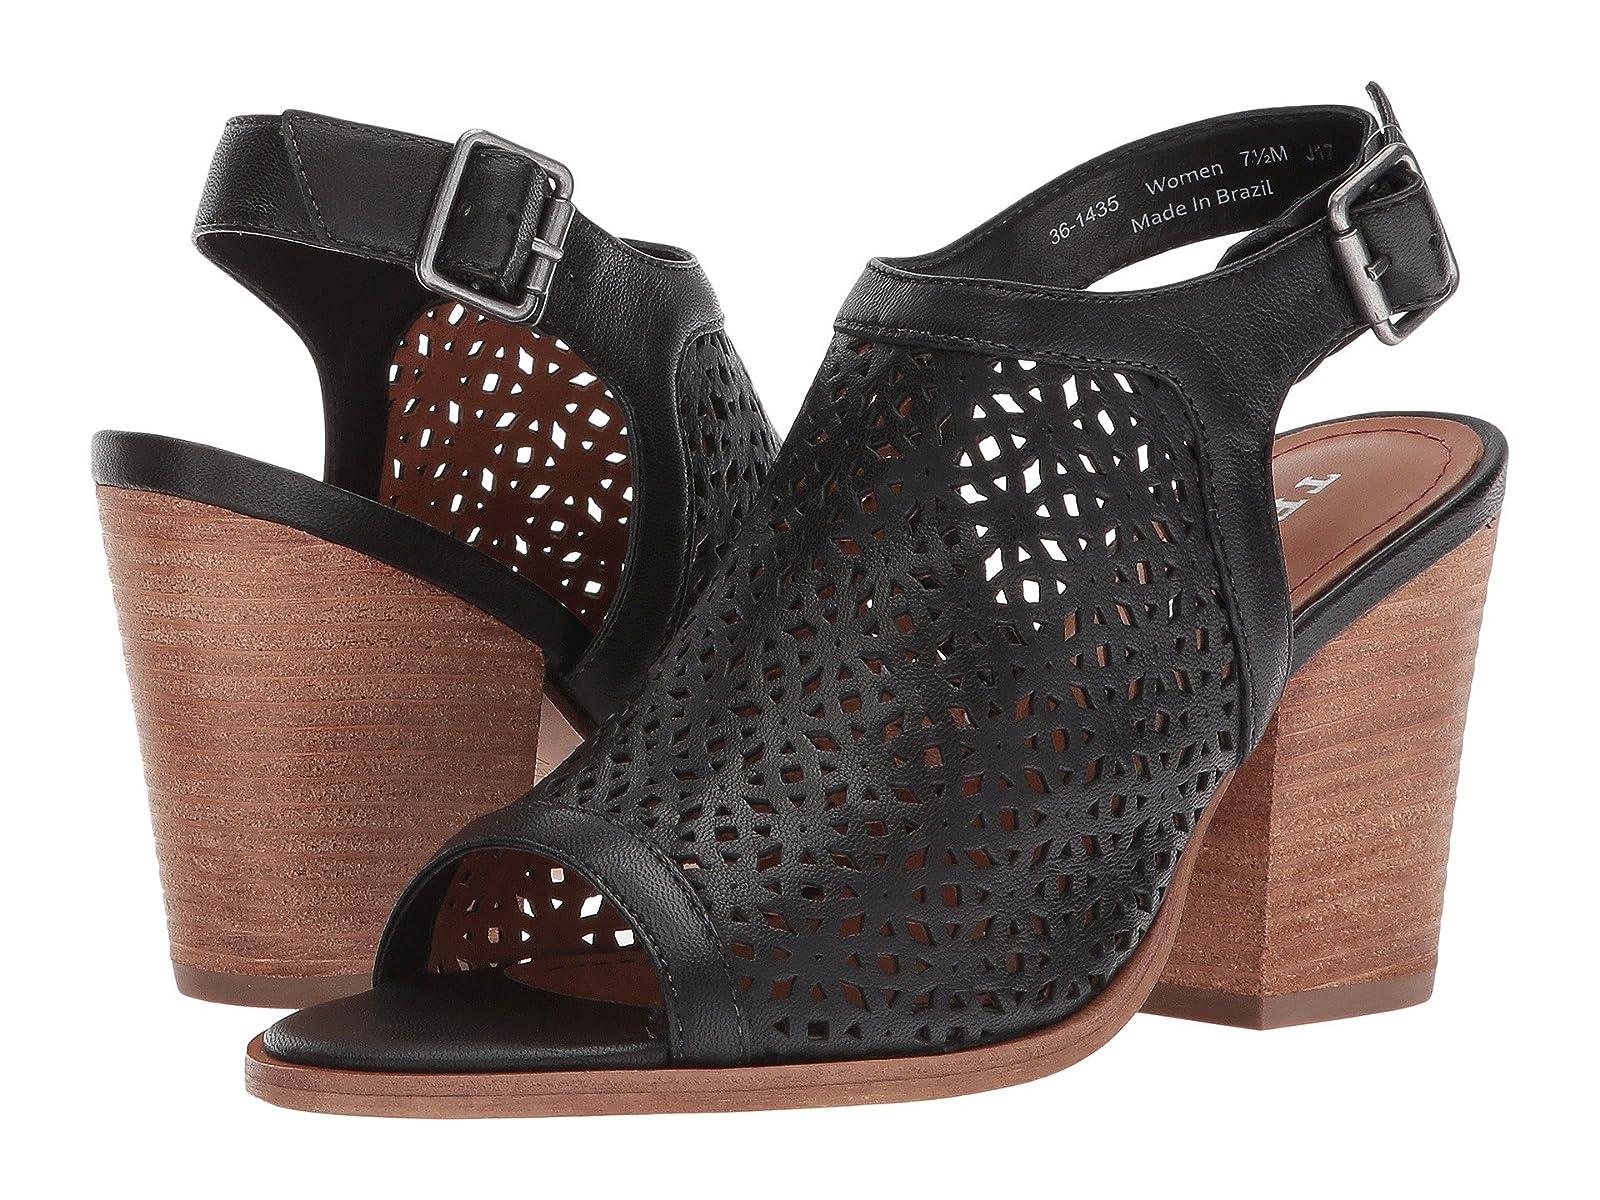 Trask Parker PerfAtmospheric grades have affordable shoes